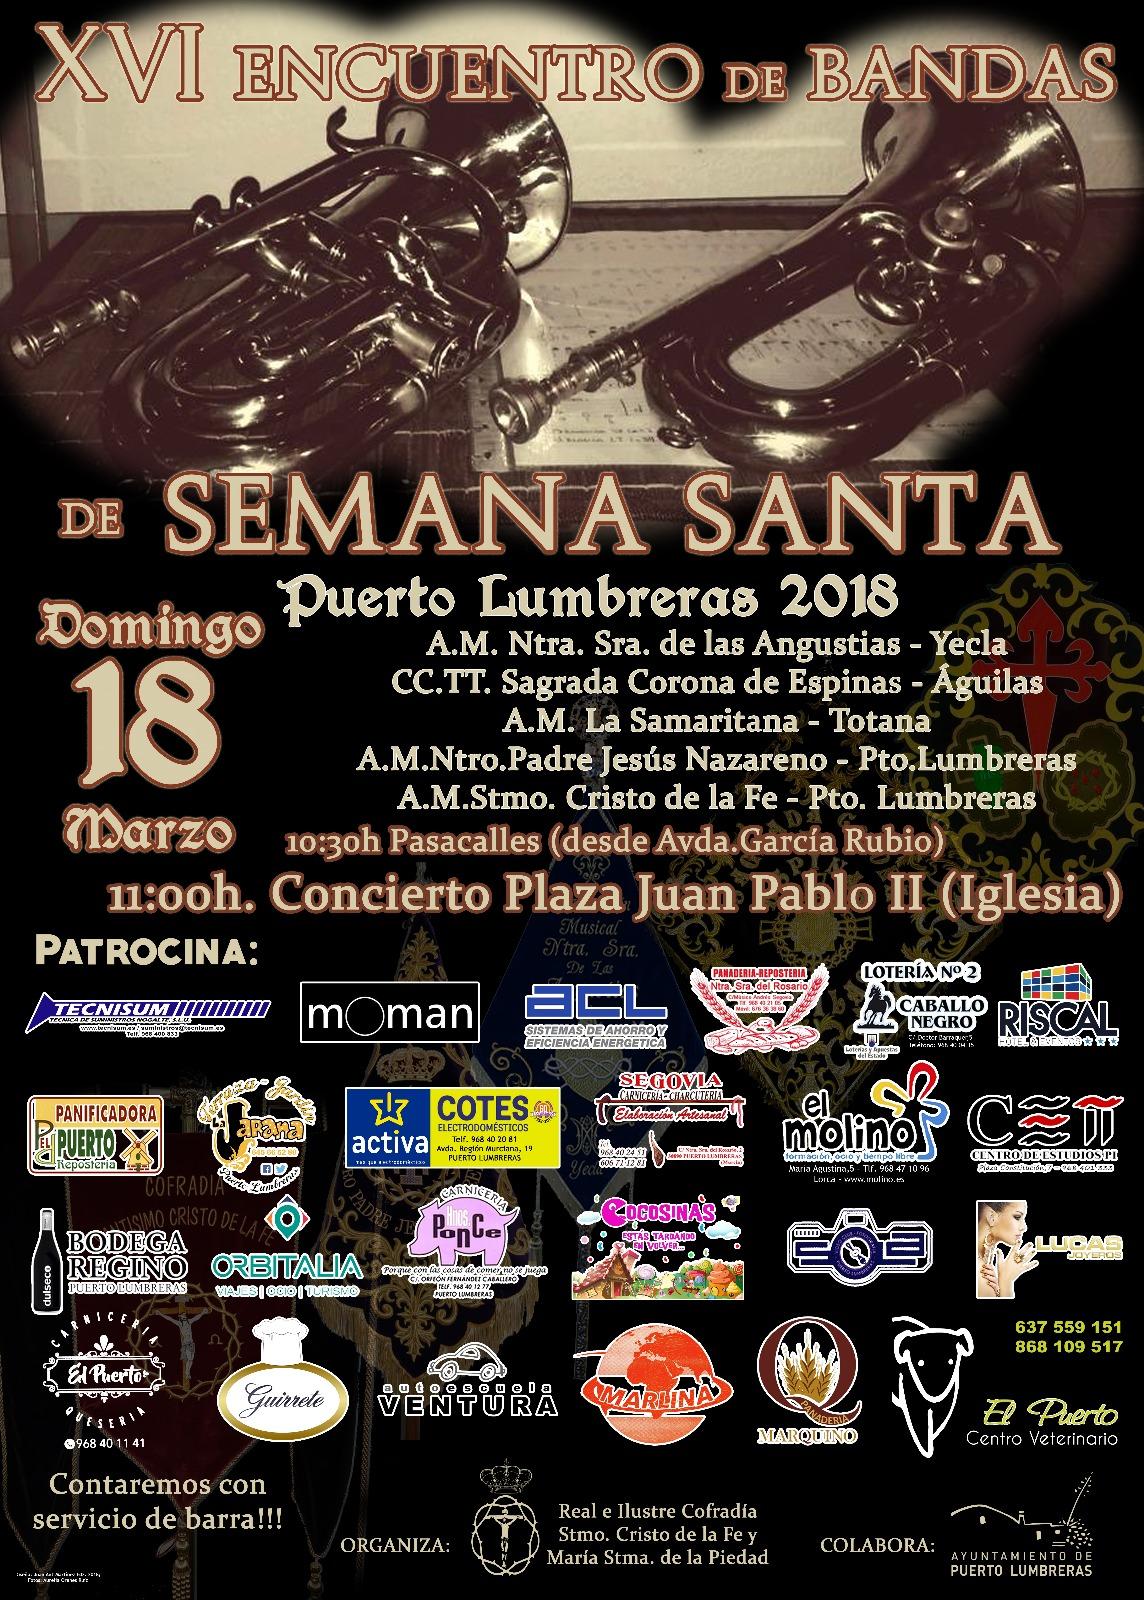 XVI ENCUENTRO DE BANDAS DE SEMANA SANTA 2018